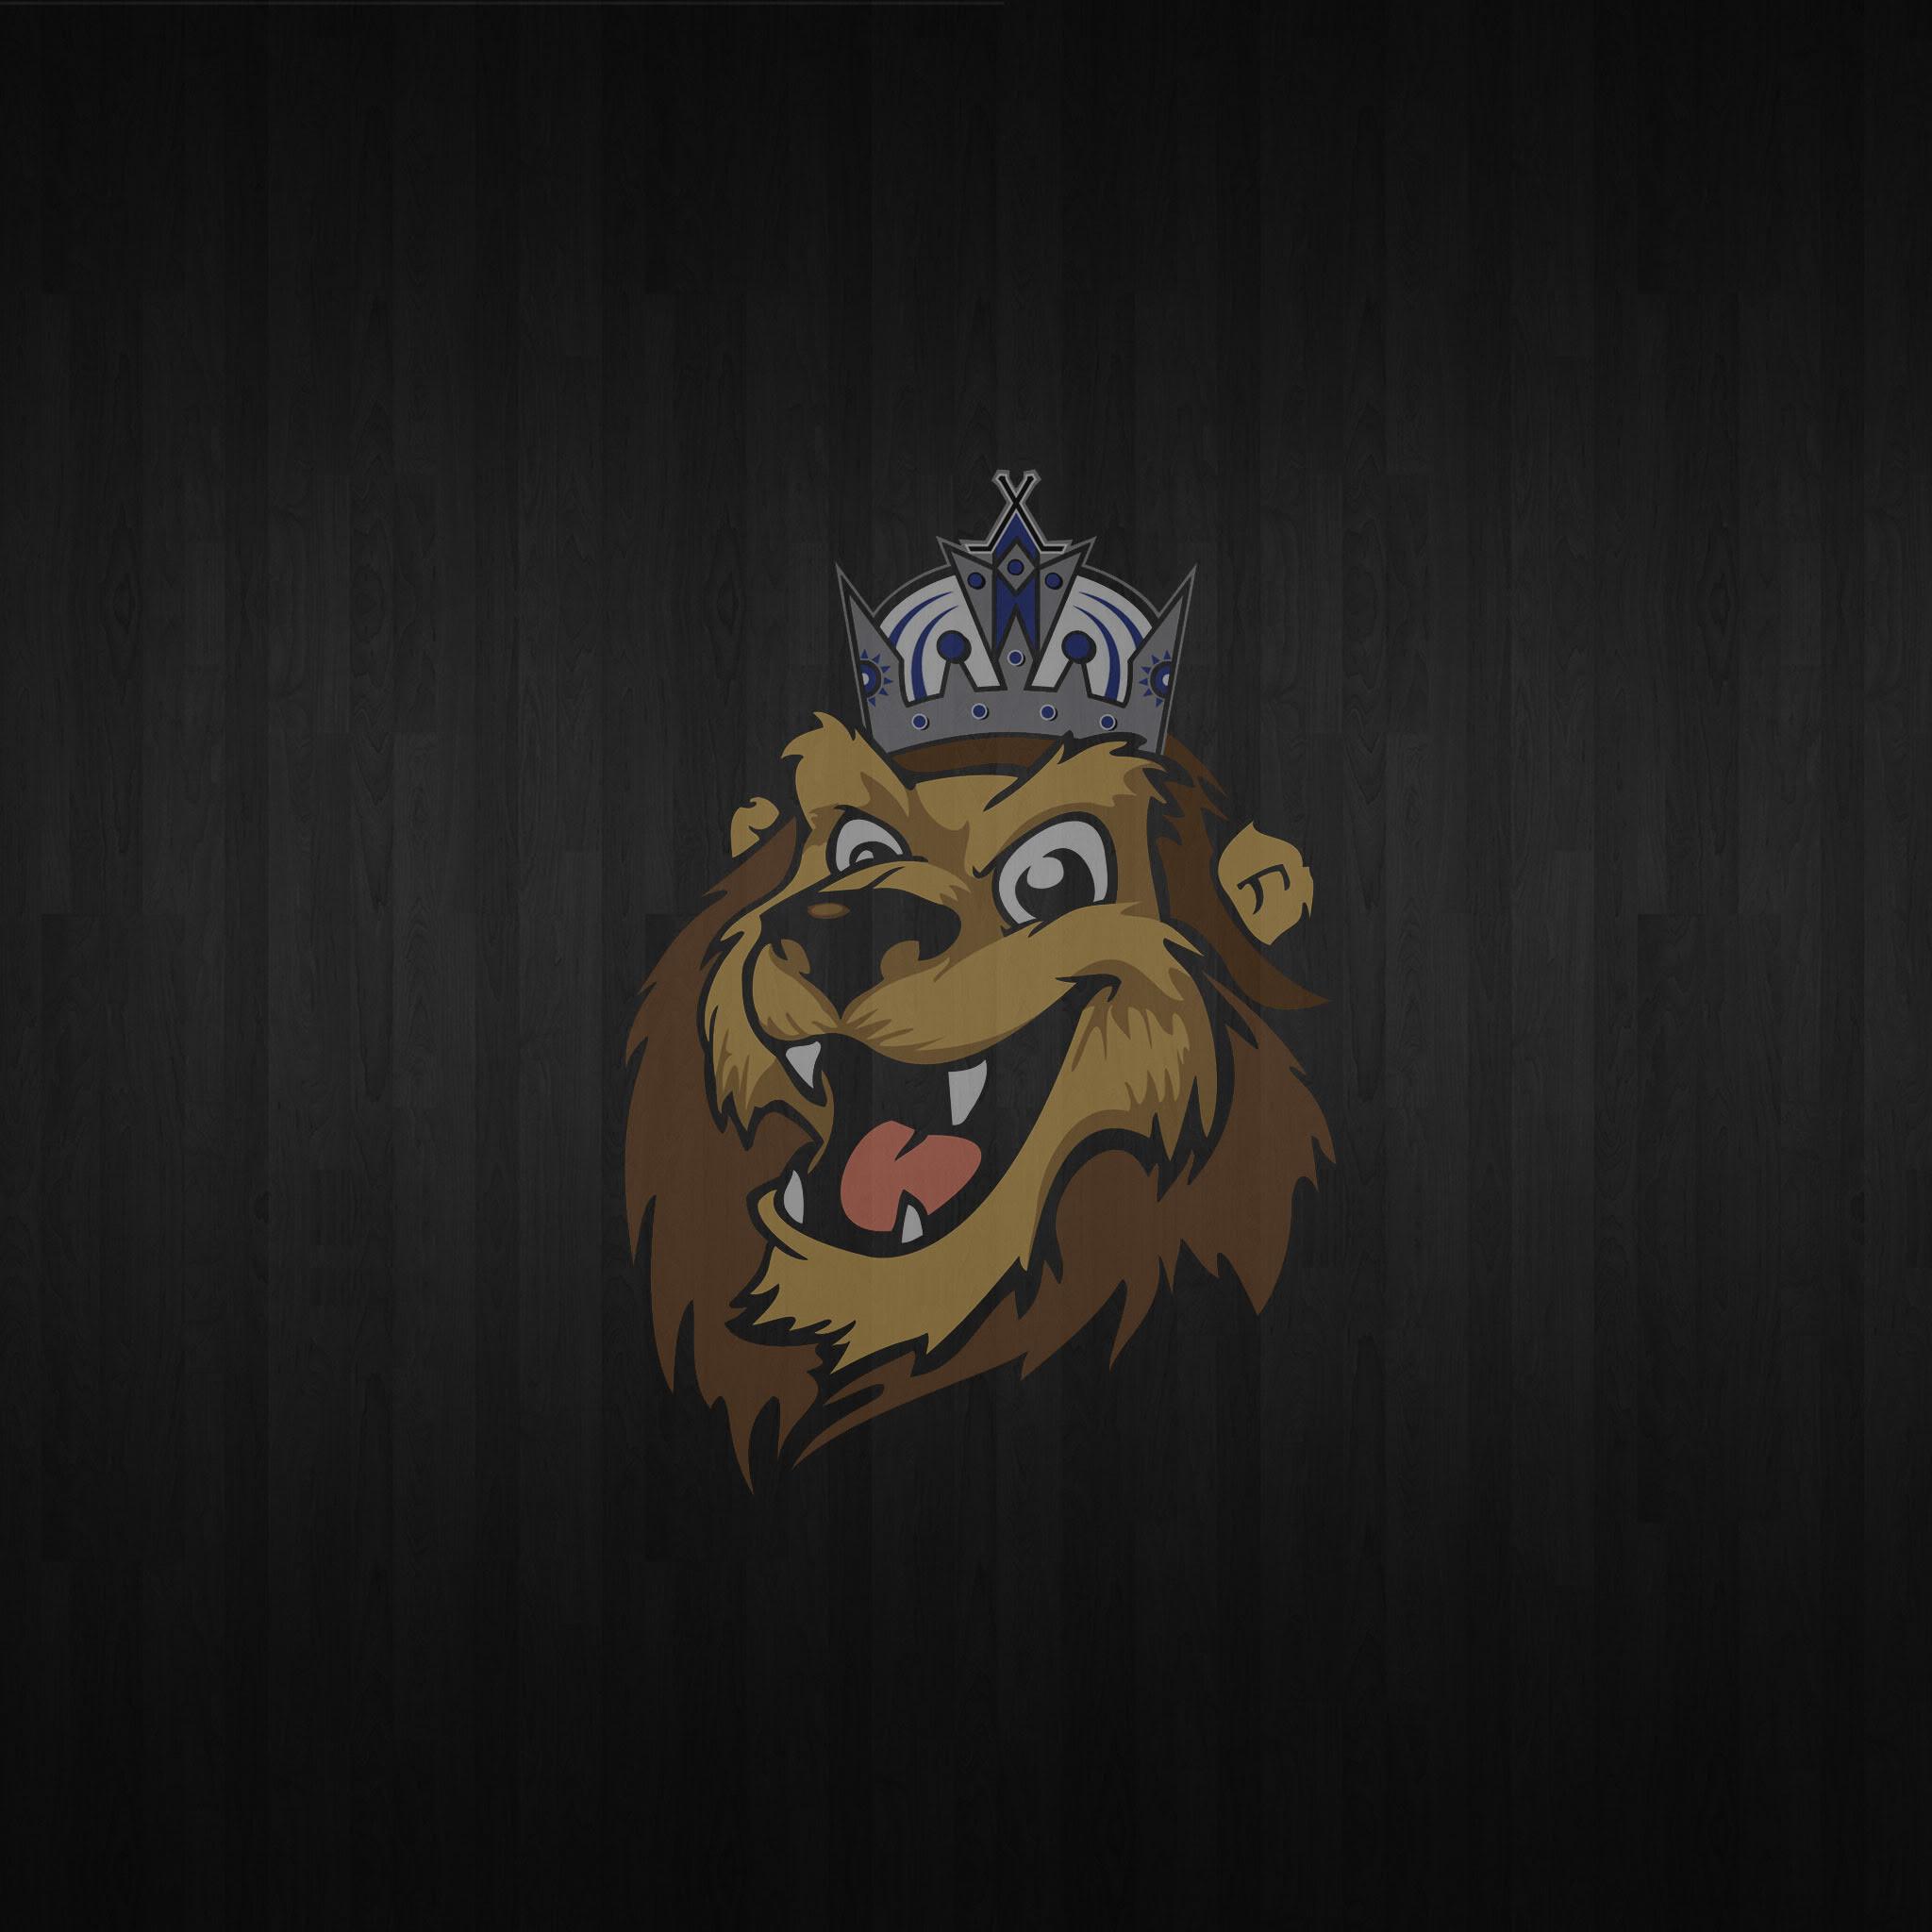 La kings logo wallpaper 72 images - Hfboards kings ...